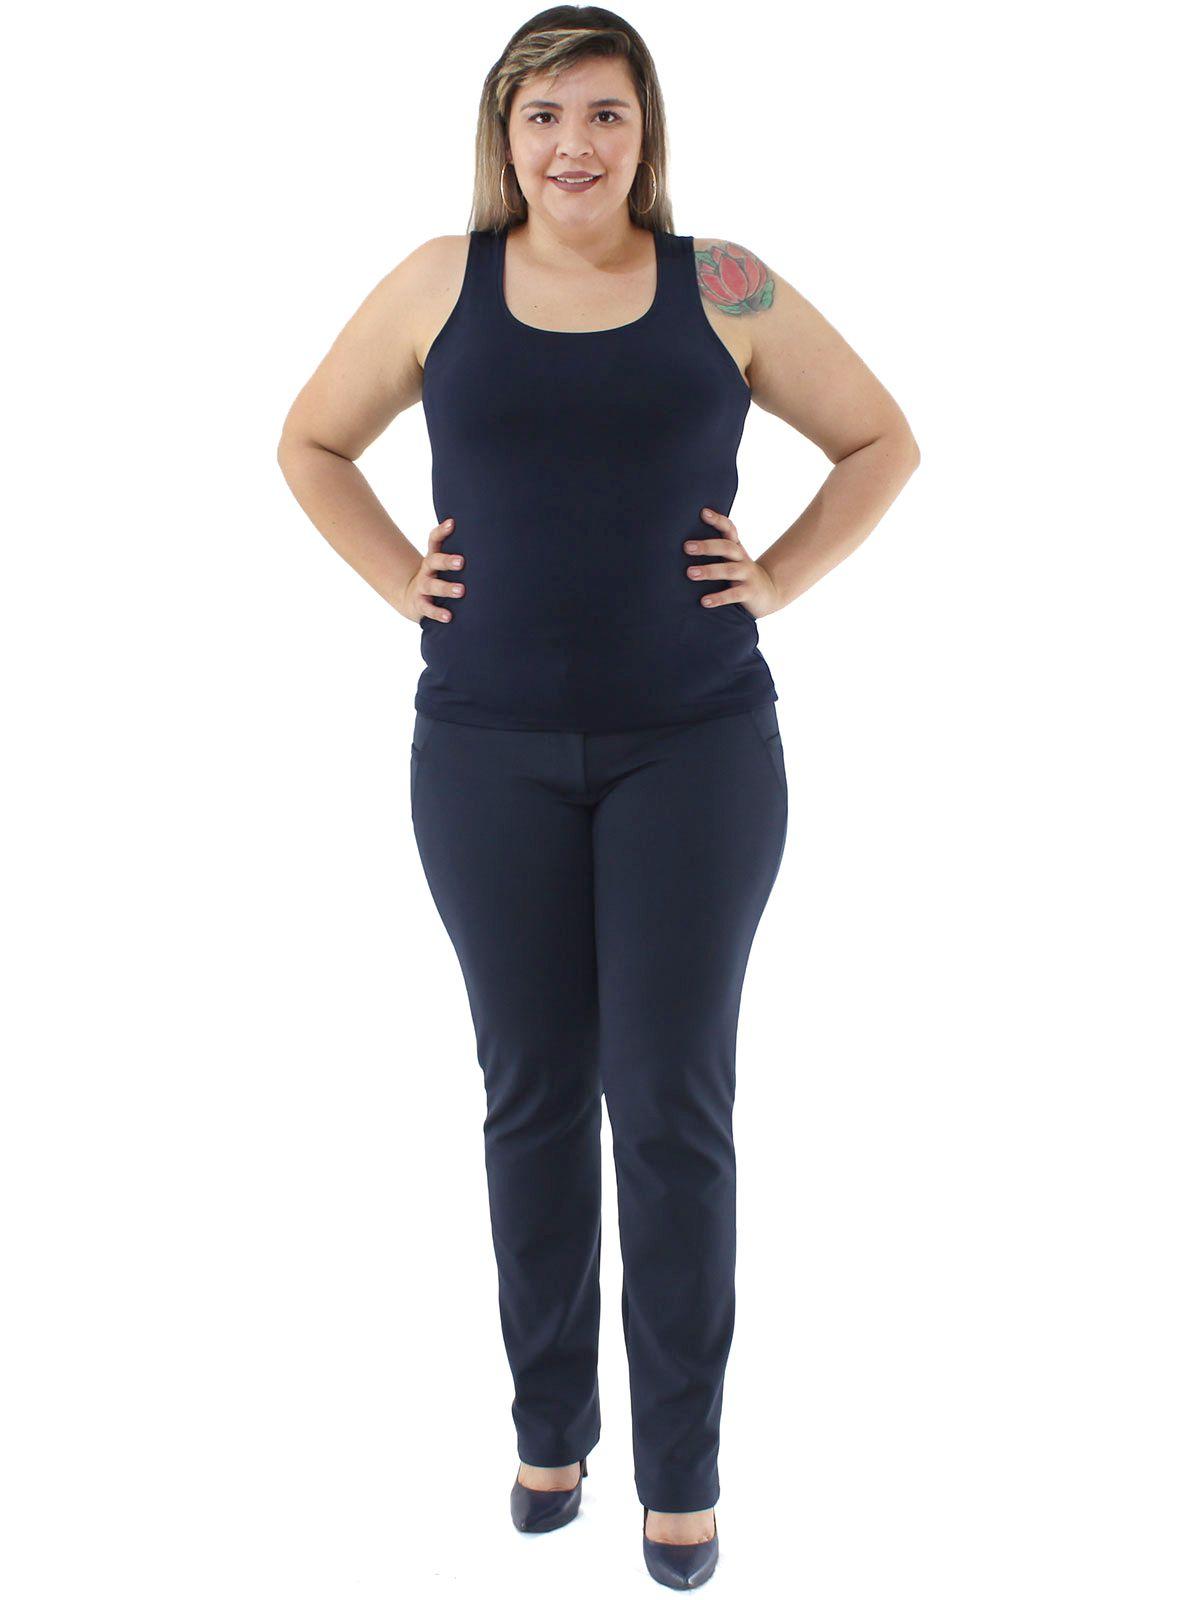 Regata Plus Size Feminina Lisa Fitness De Poliamida Azul Marinho